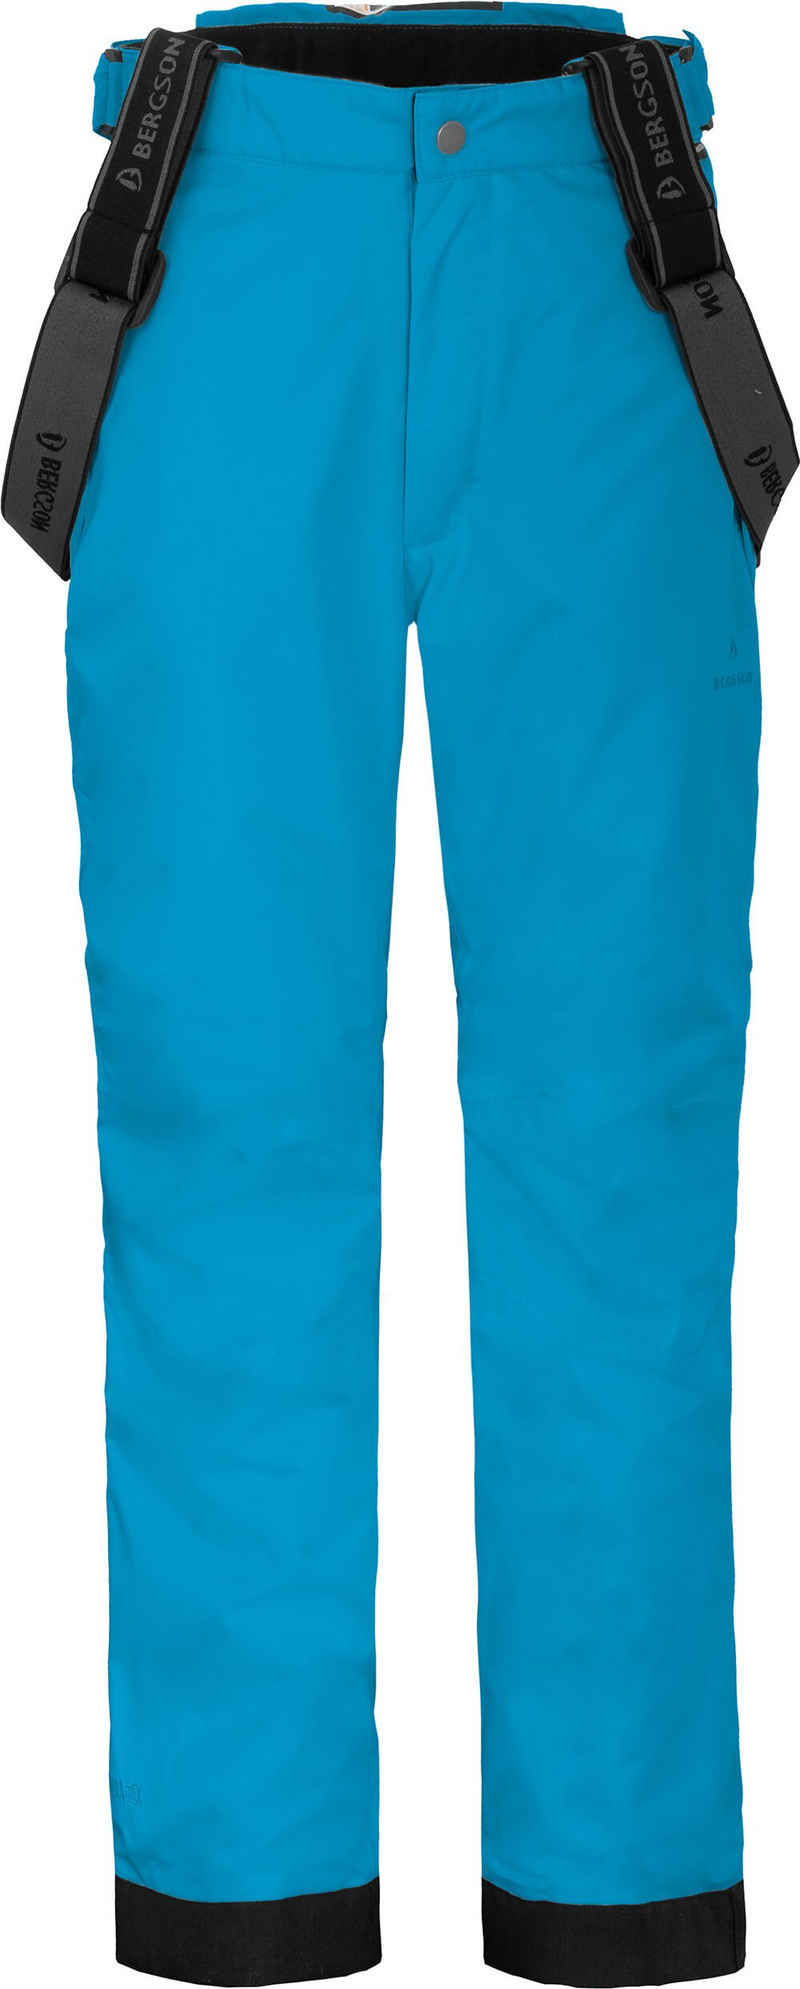 Bergson Skihose »LUCA« Kinder Skihose, wattiert, 12000 mm Wassersäule, Normalgrößen, Ozean blau